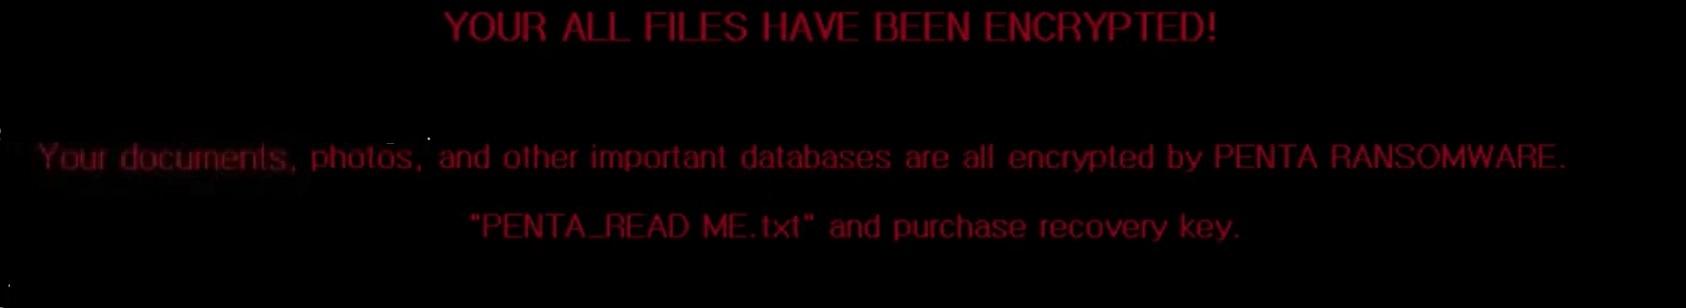 penta ransomware desktop wallpaper